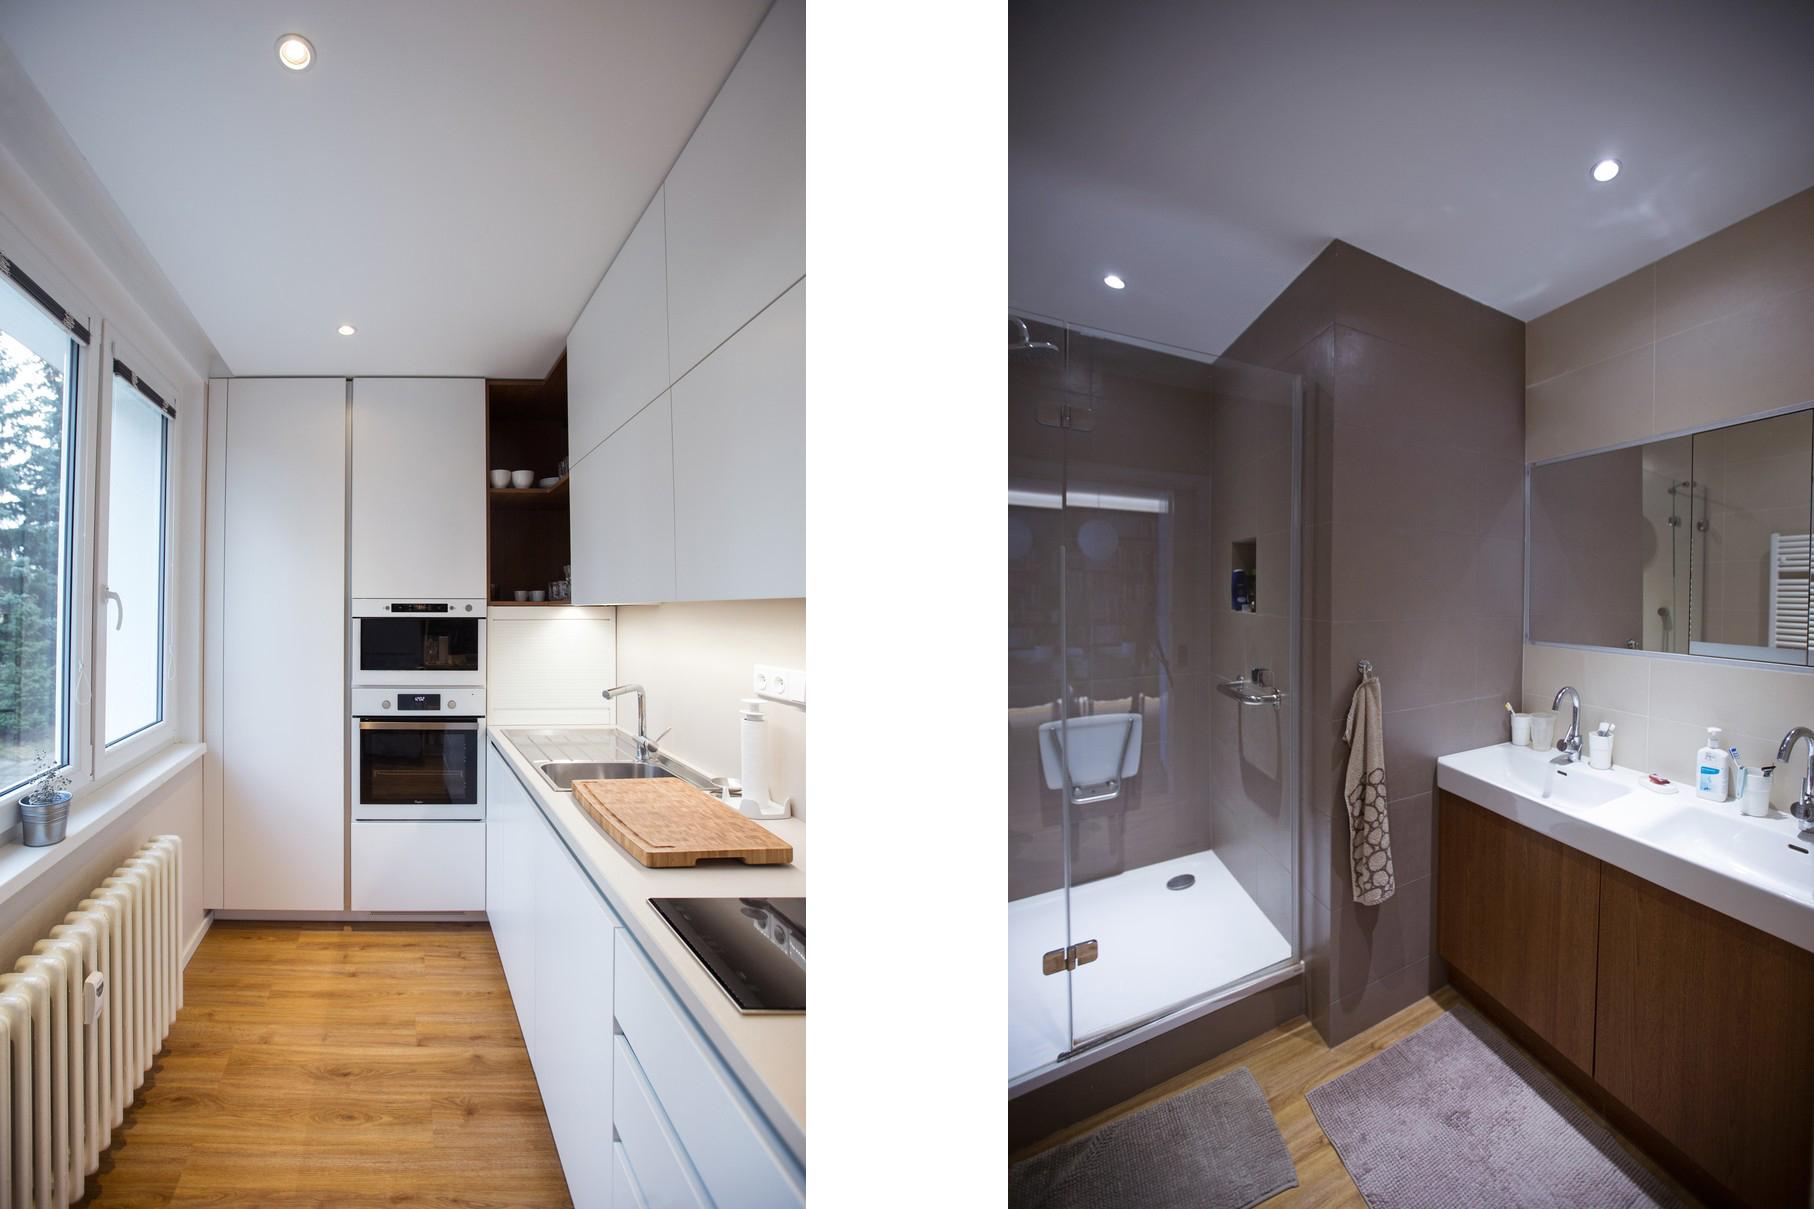 kuchyne+koupelna-web